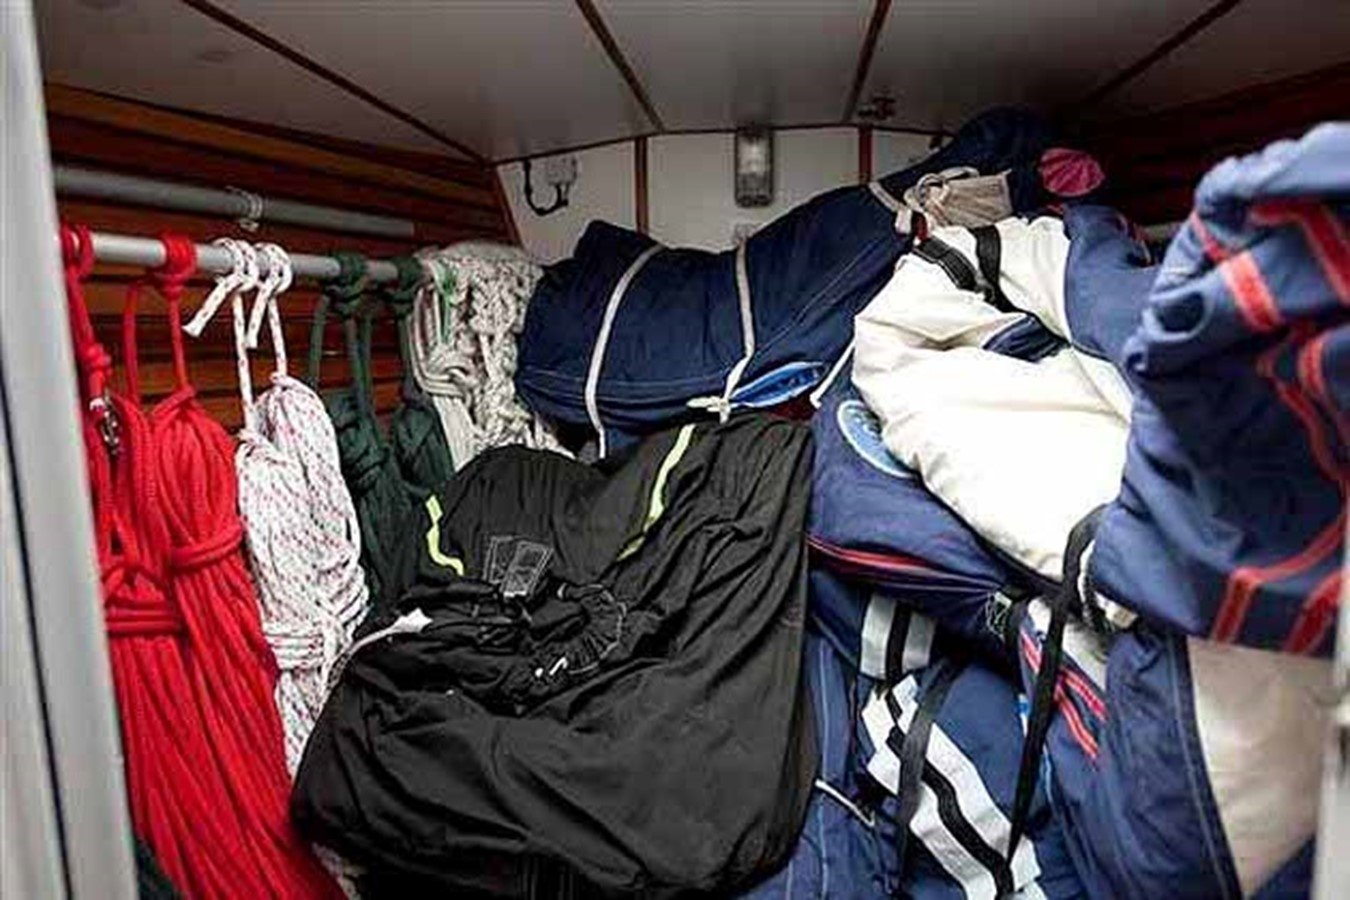 2000 DEVONPORT YACHTS Devonport Challenge 72 Cruising Sailboat 1516101